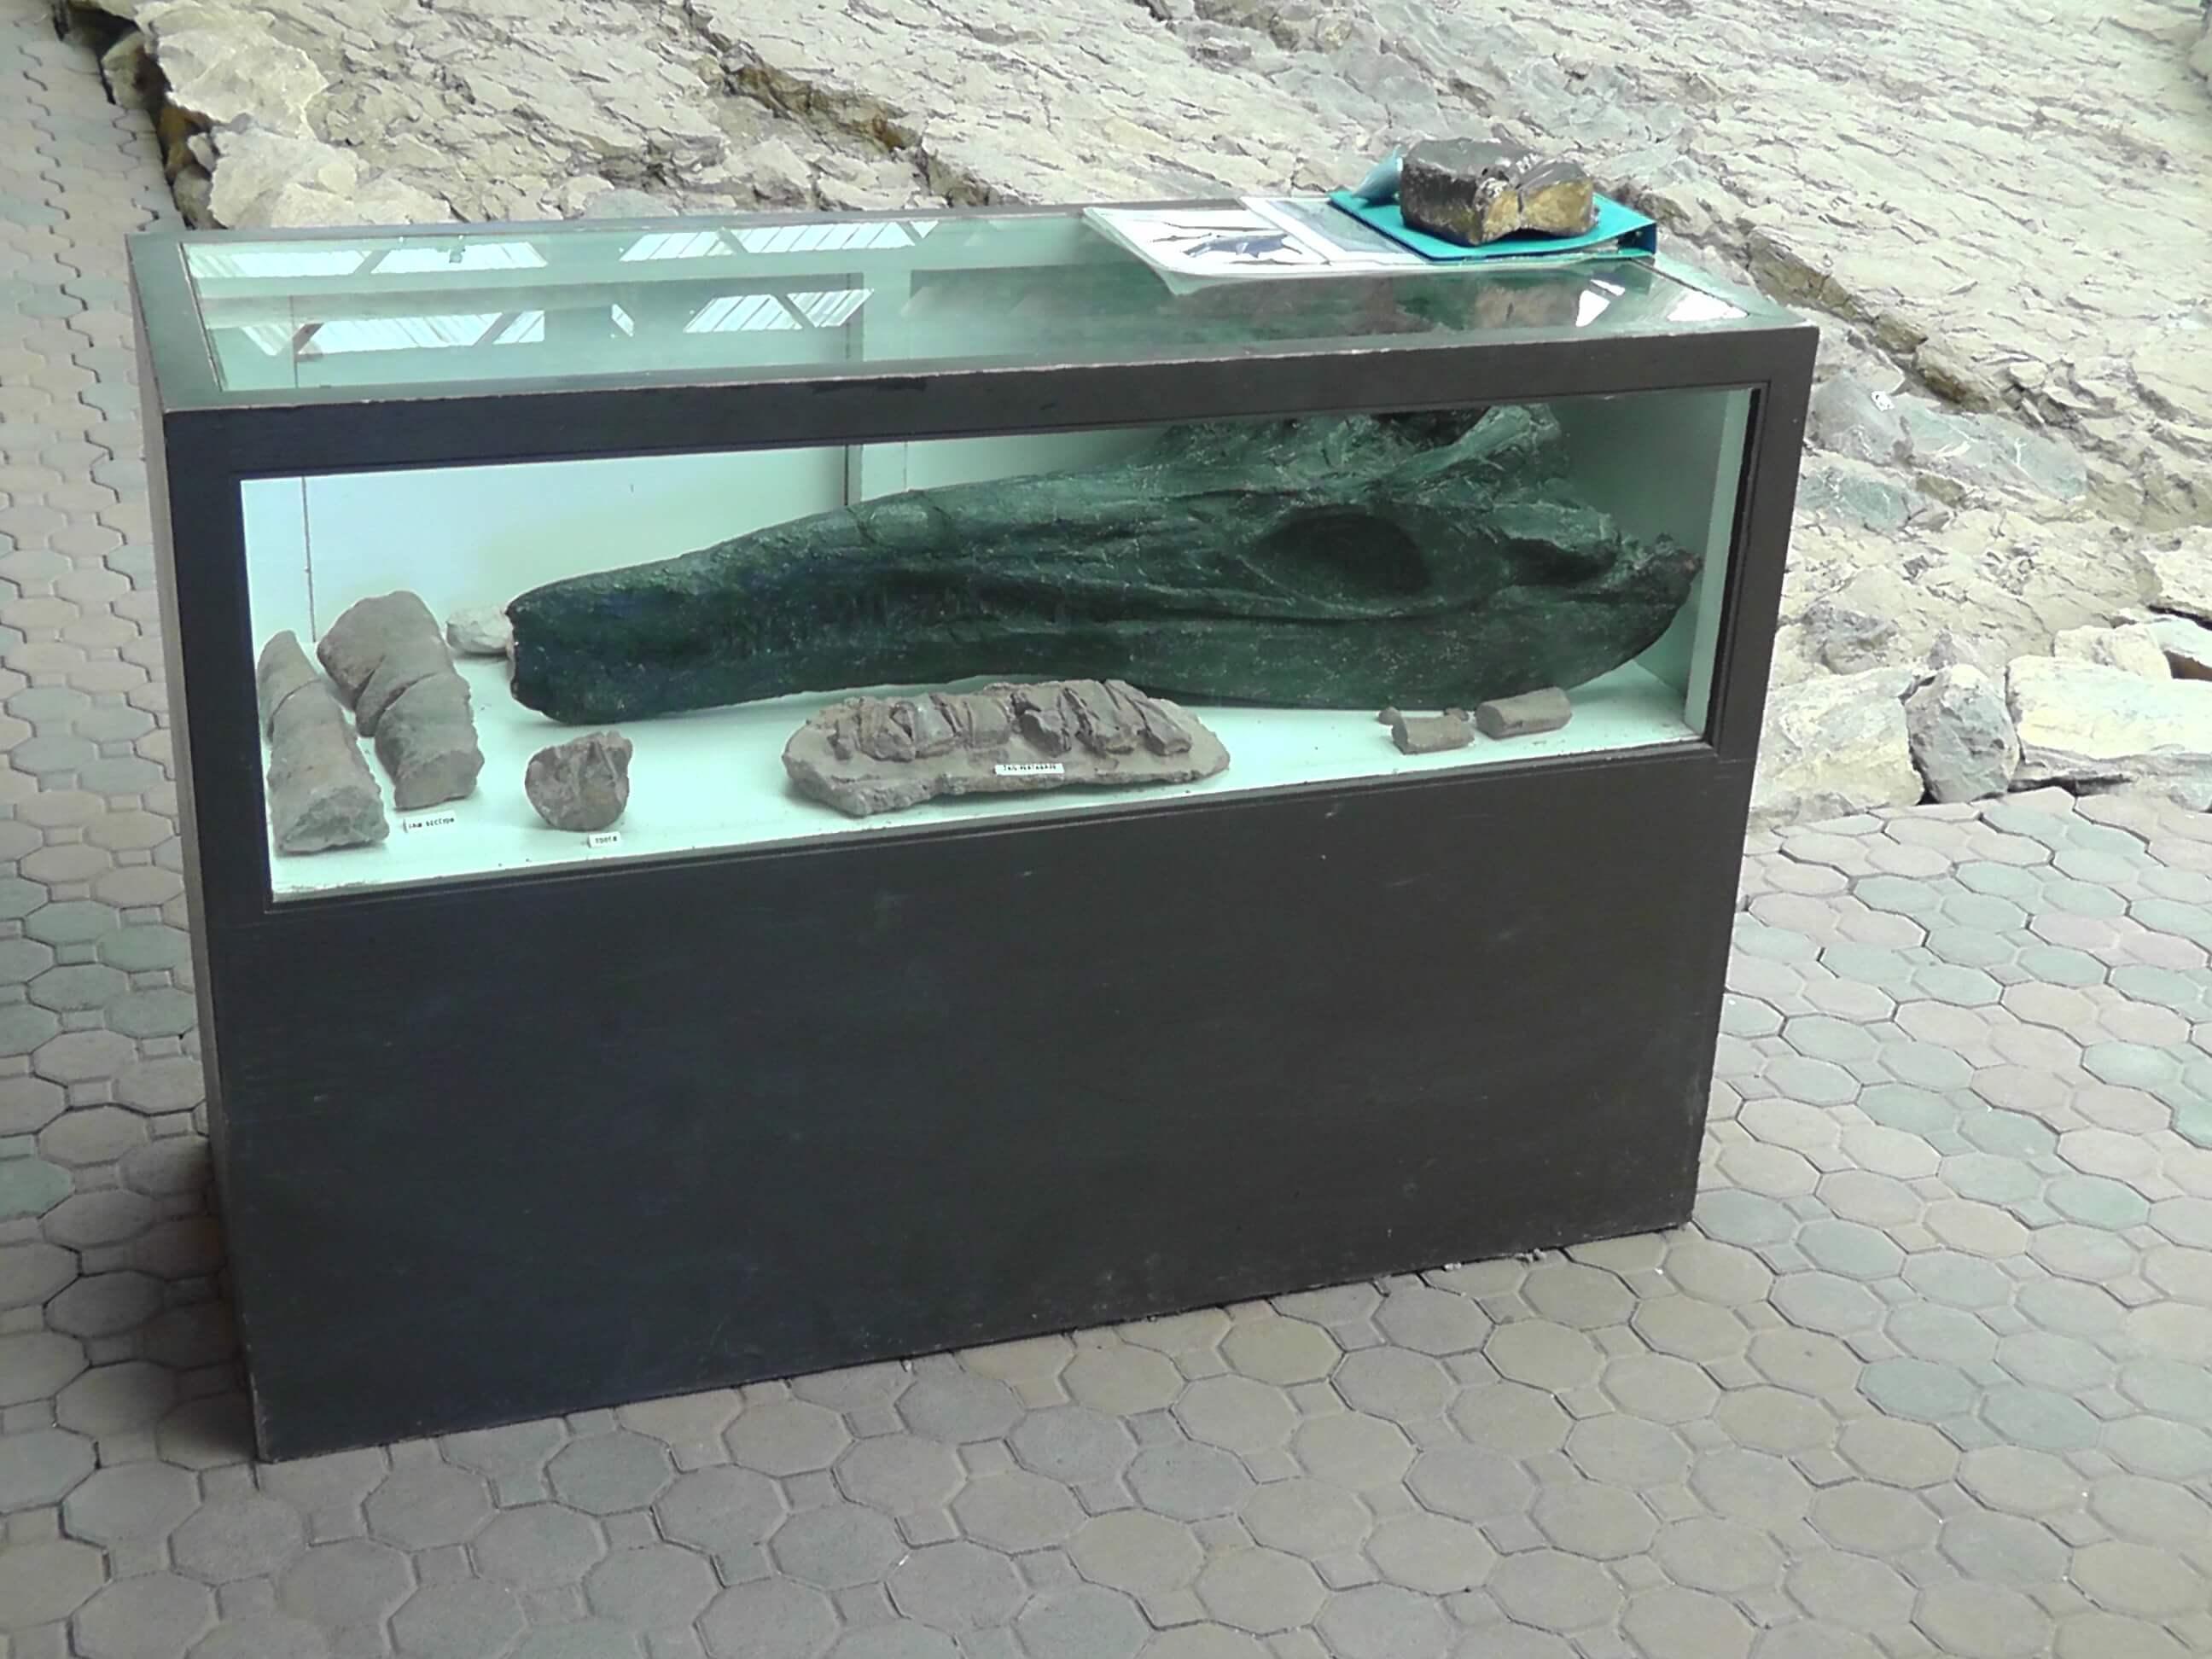 Ichthyosaur skull, Berlin/Ichthyosaur State Park, Nevada